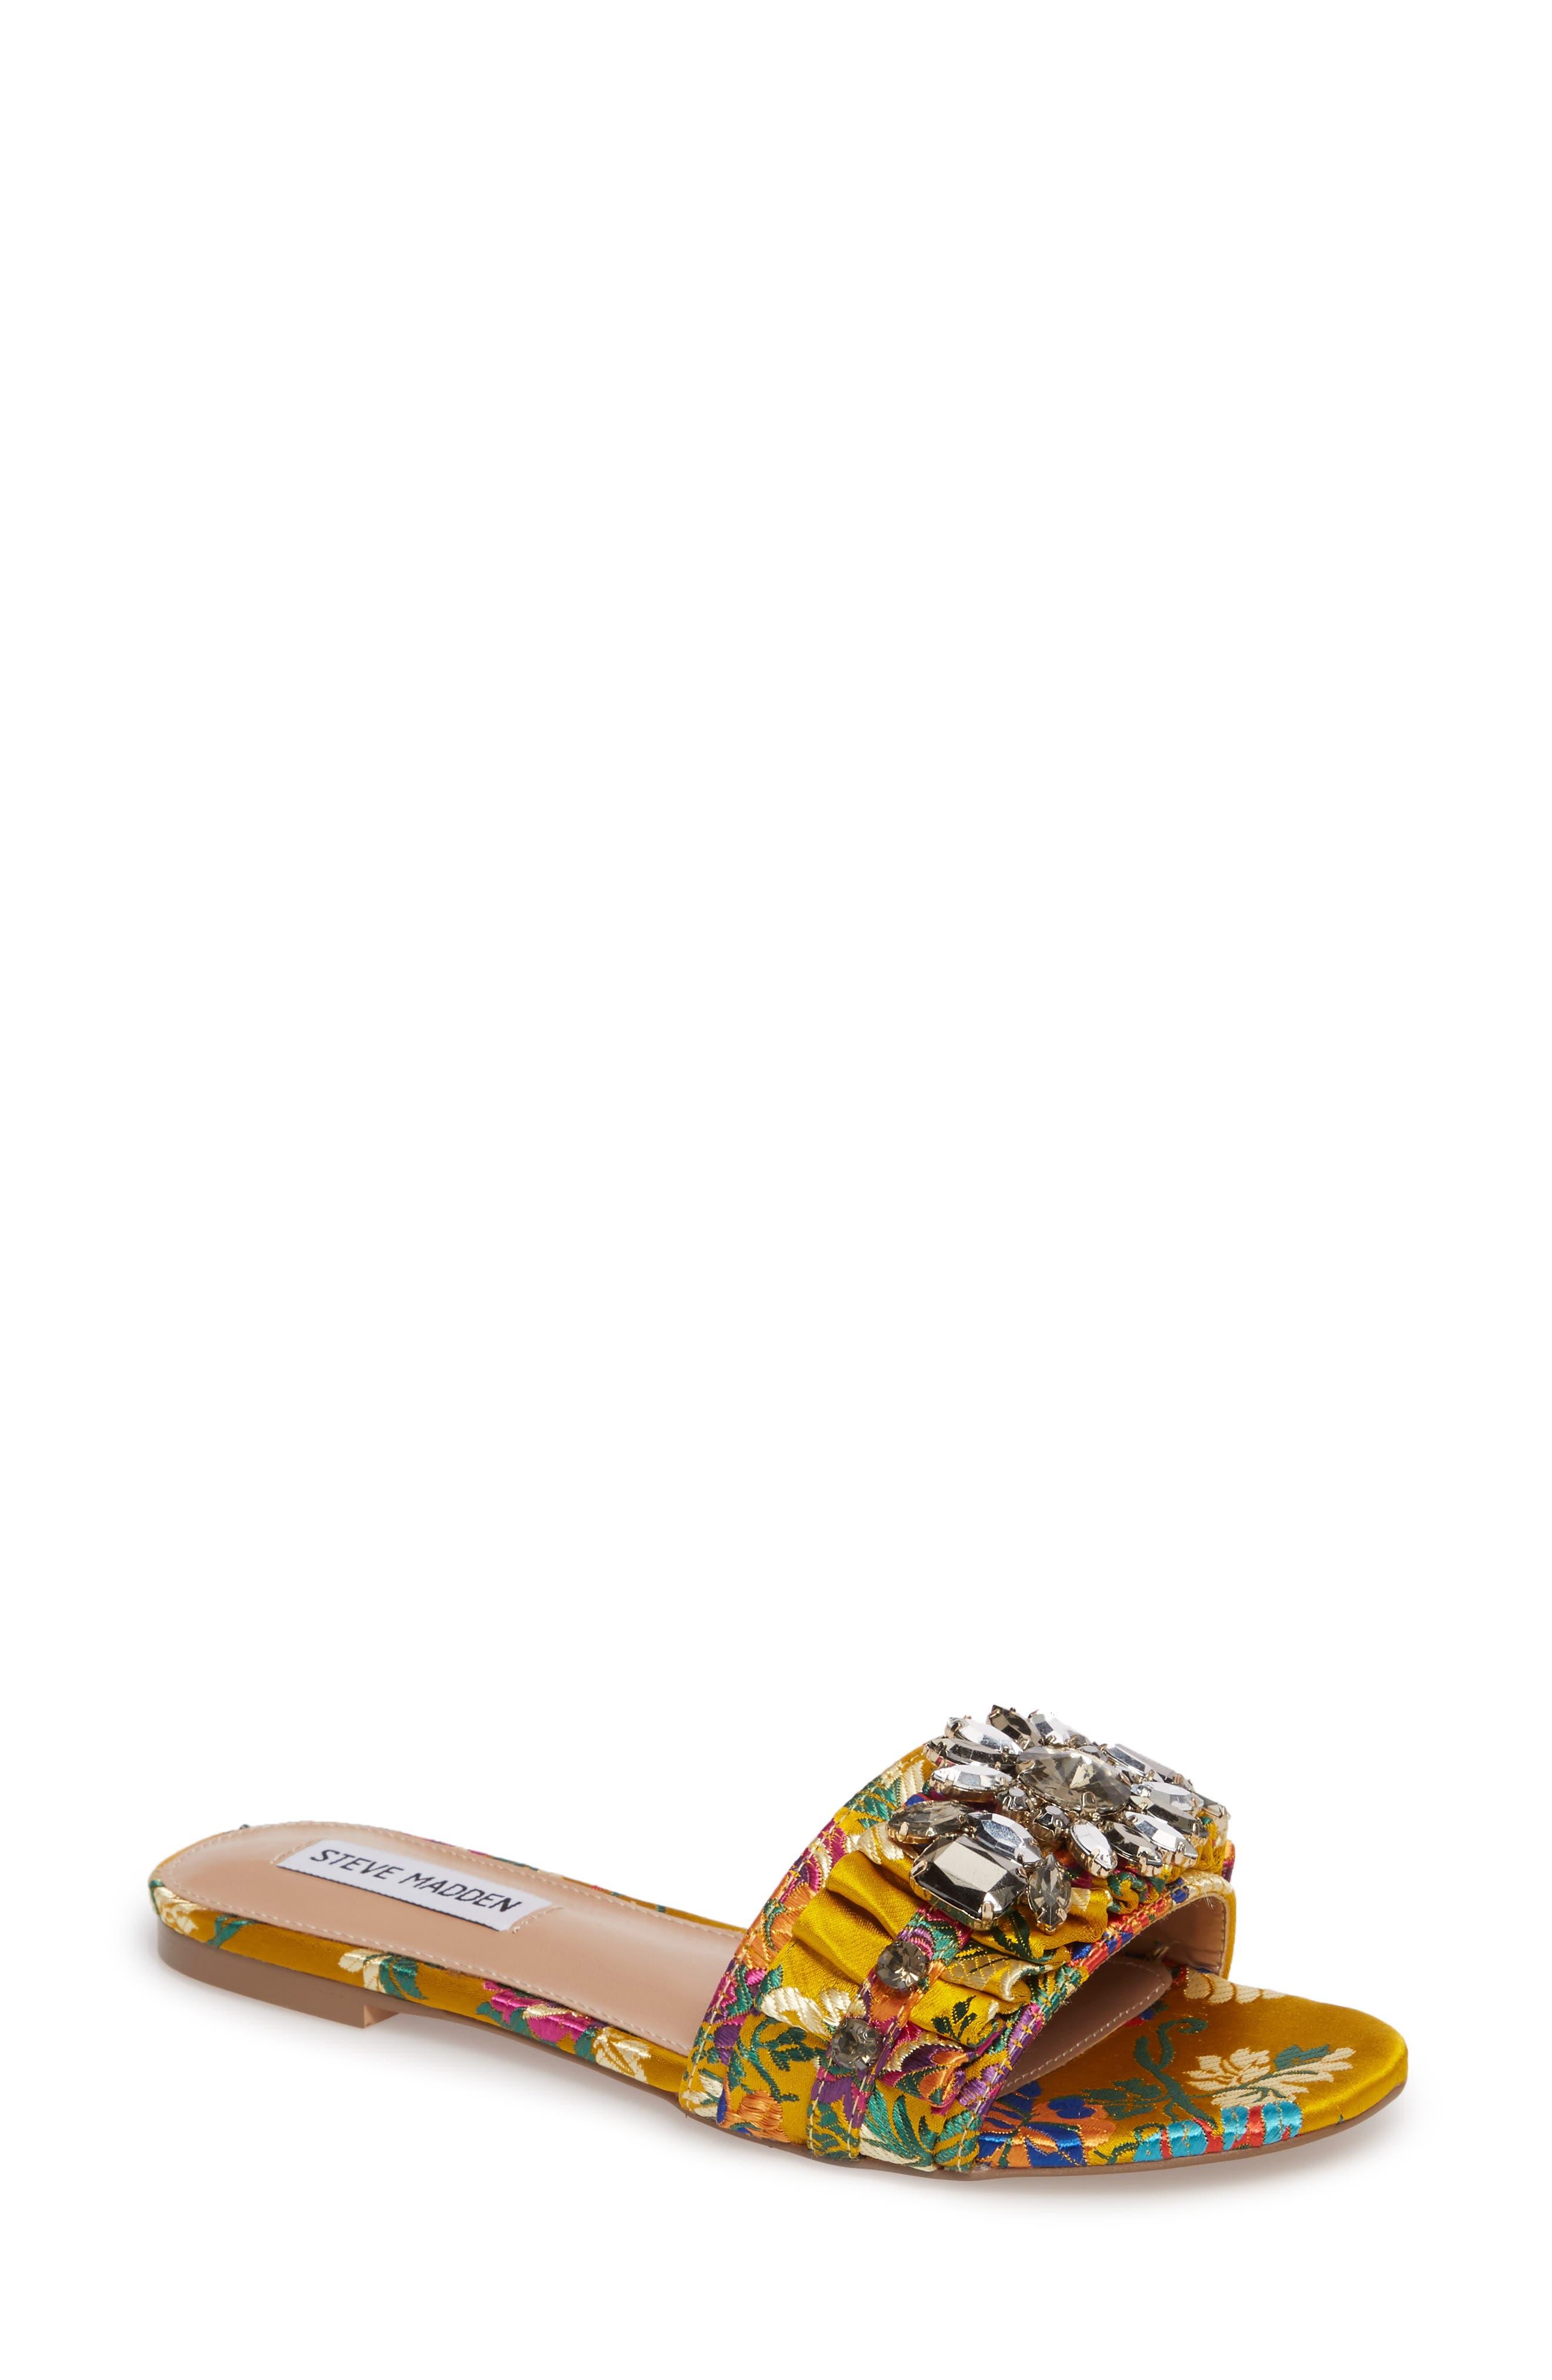 Alternate Image 1 Selected - Steve Madden Pomona Crystal Embellished Slide Sandal (Women)